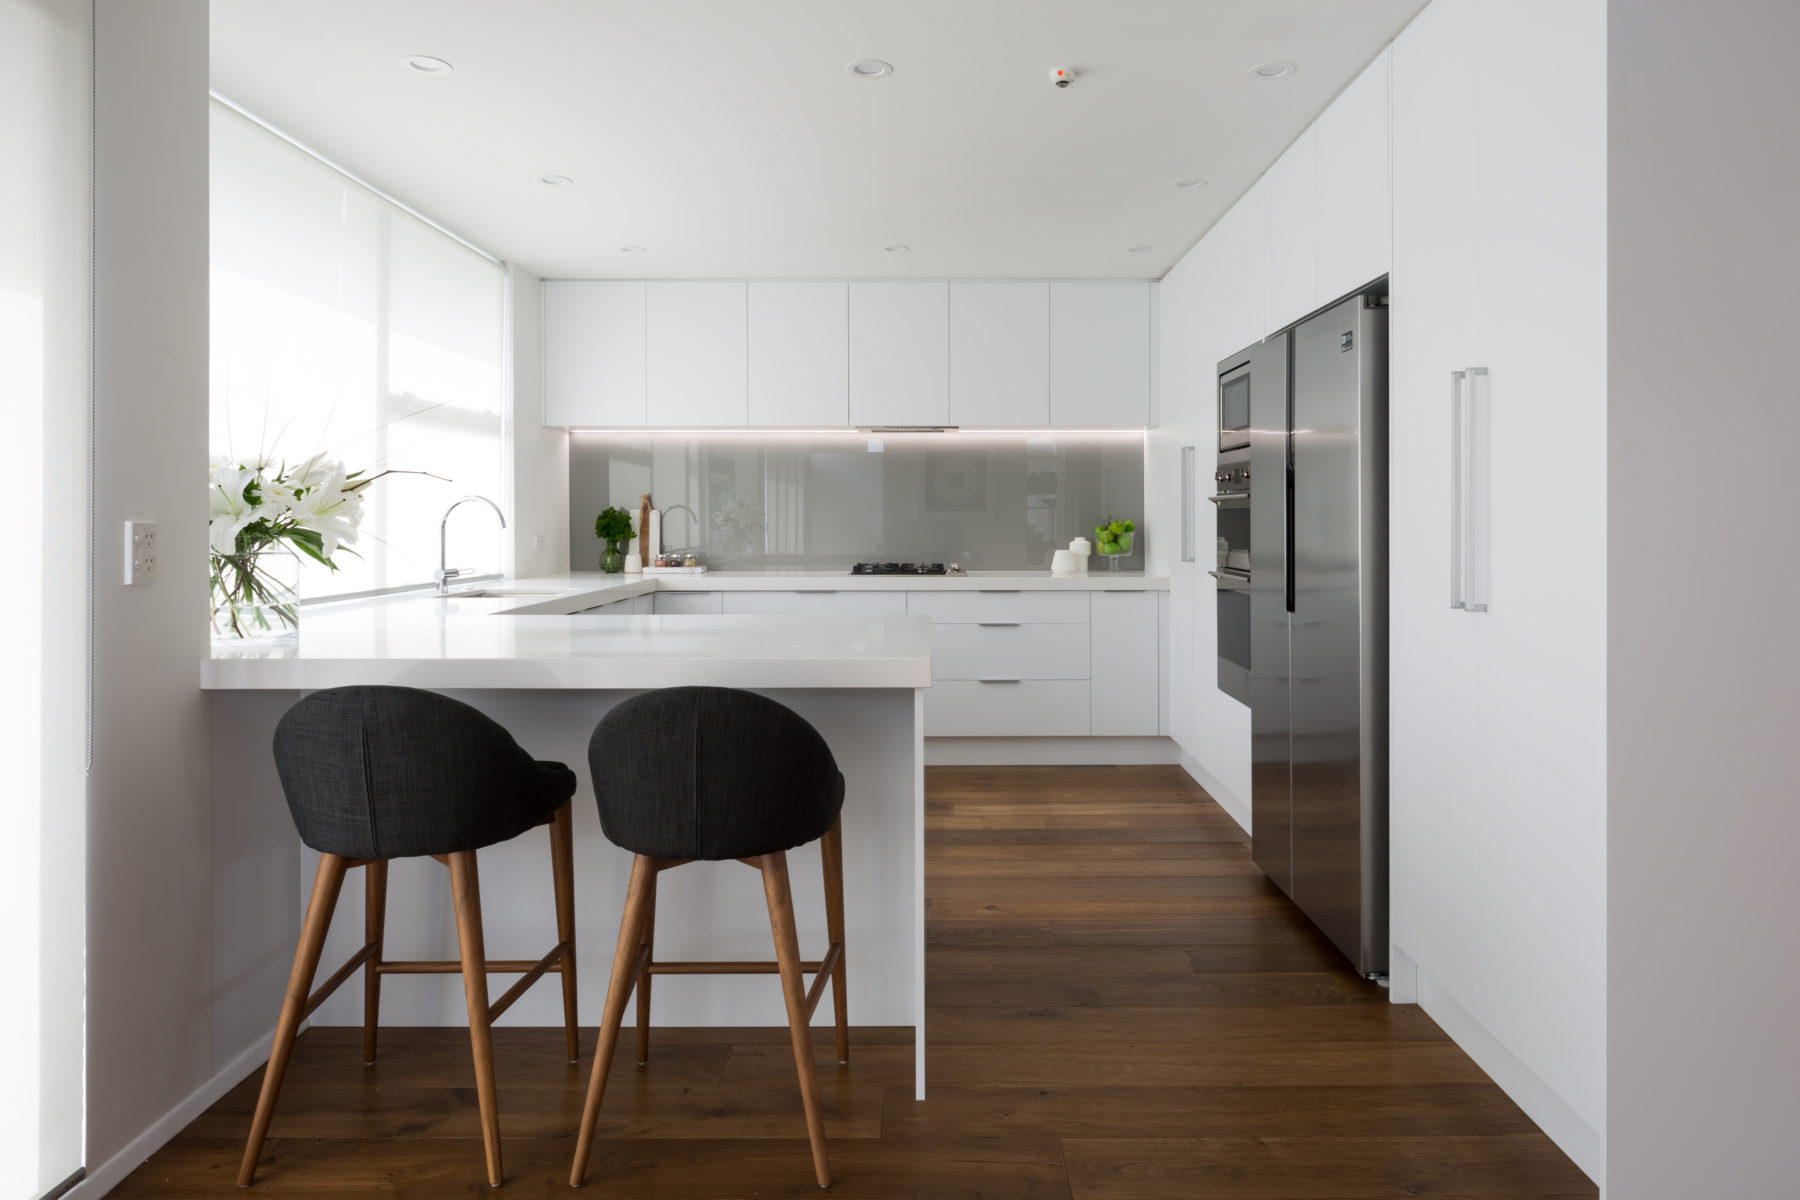 modern custom made white kitchen with green glass splashback and barstools